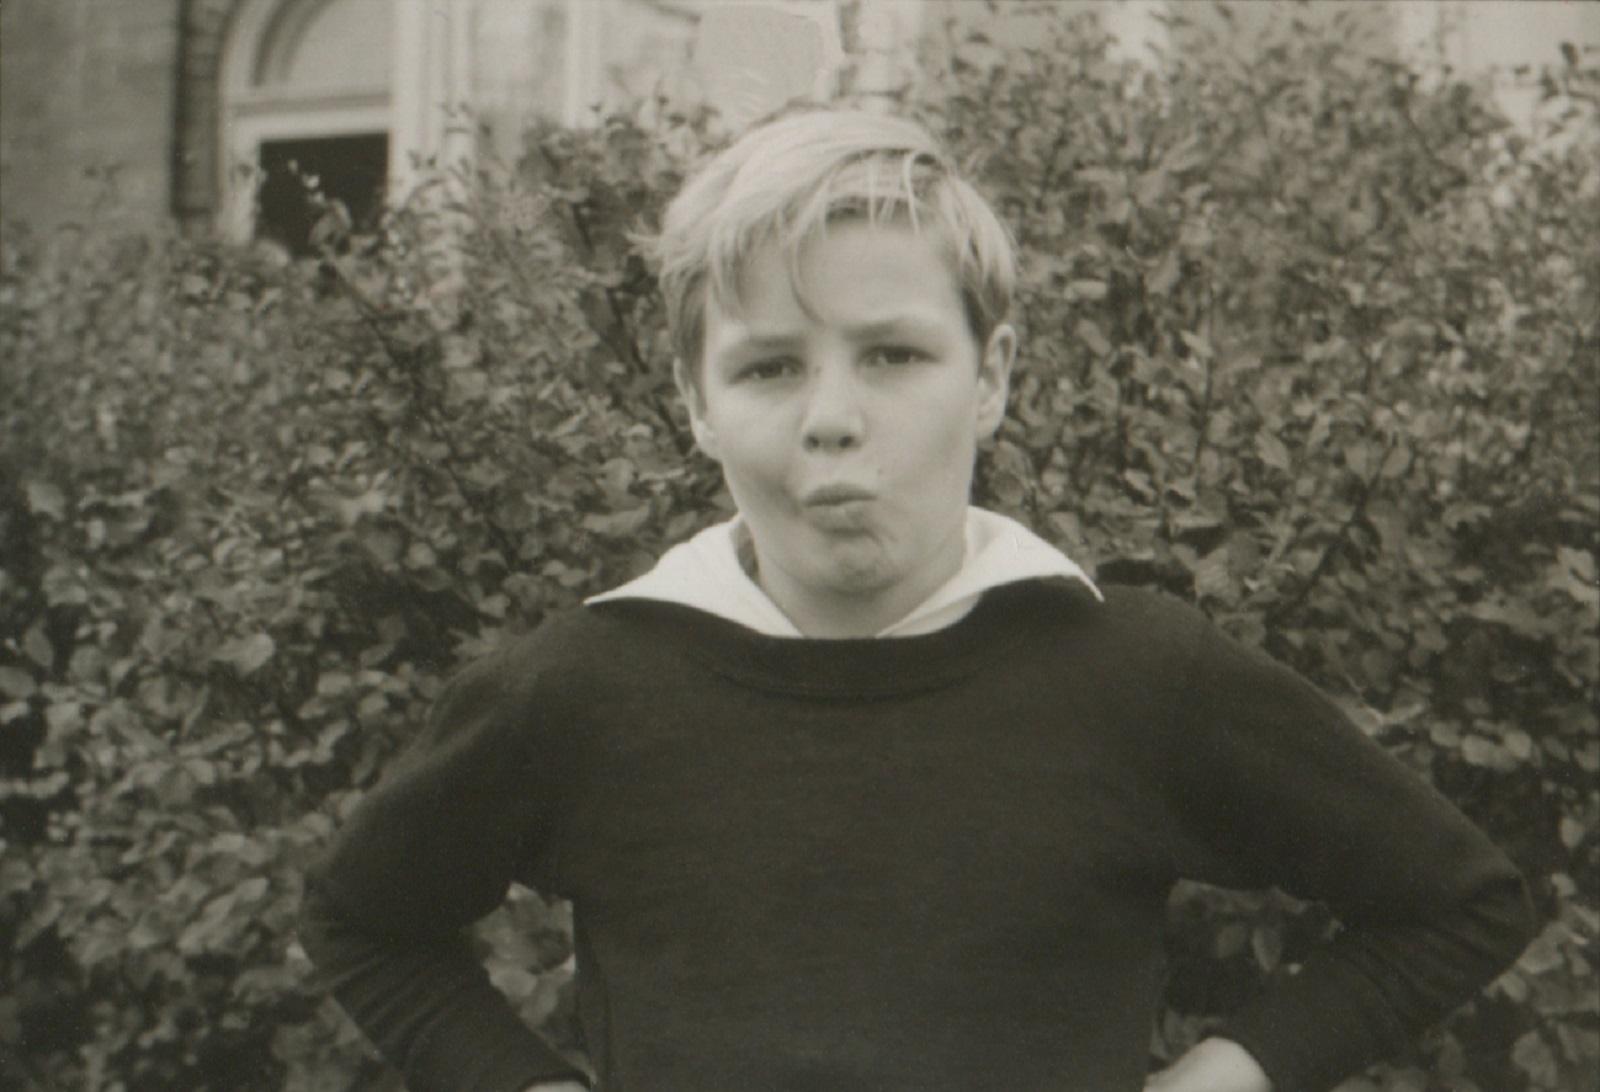 Marlon Brando Children